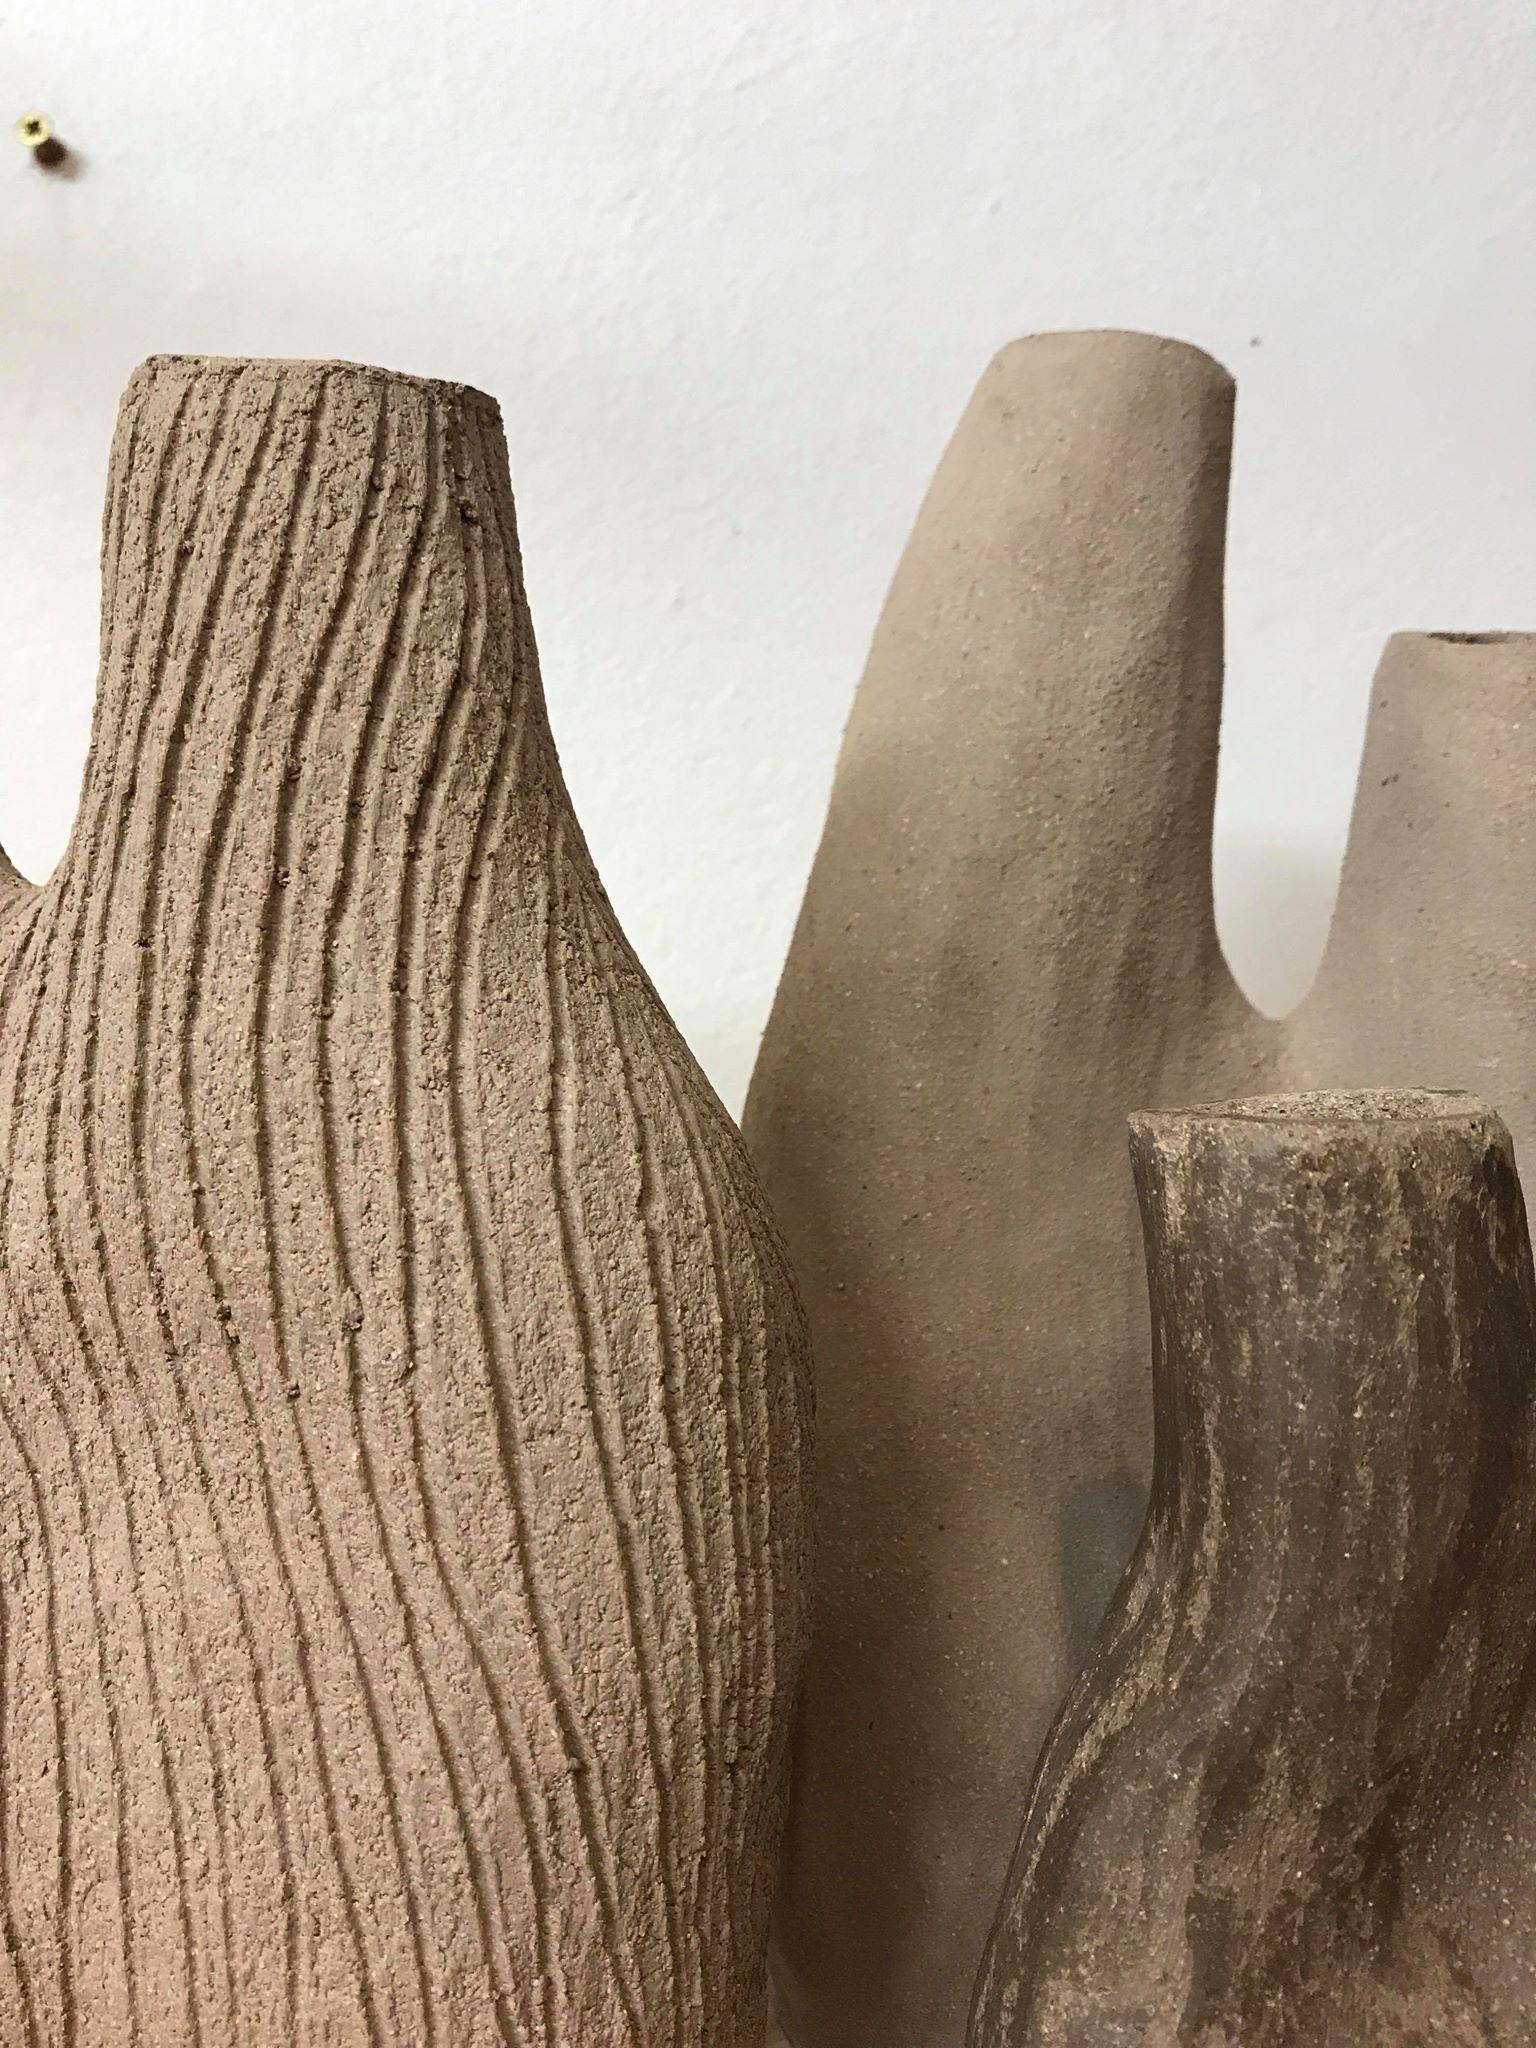 Skulptur/vas liten sandfärgad